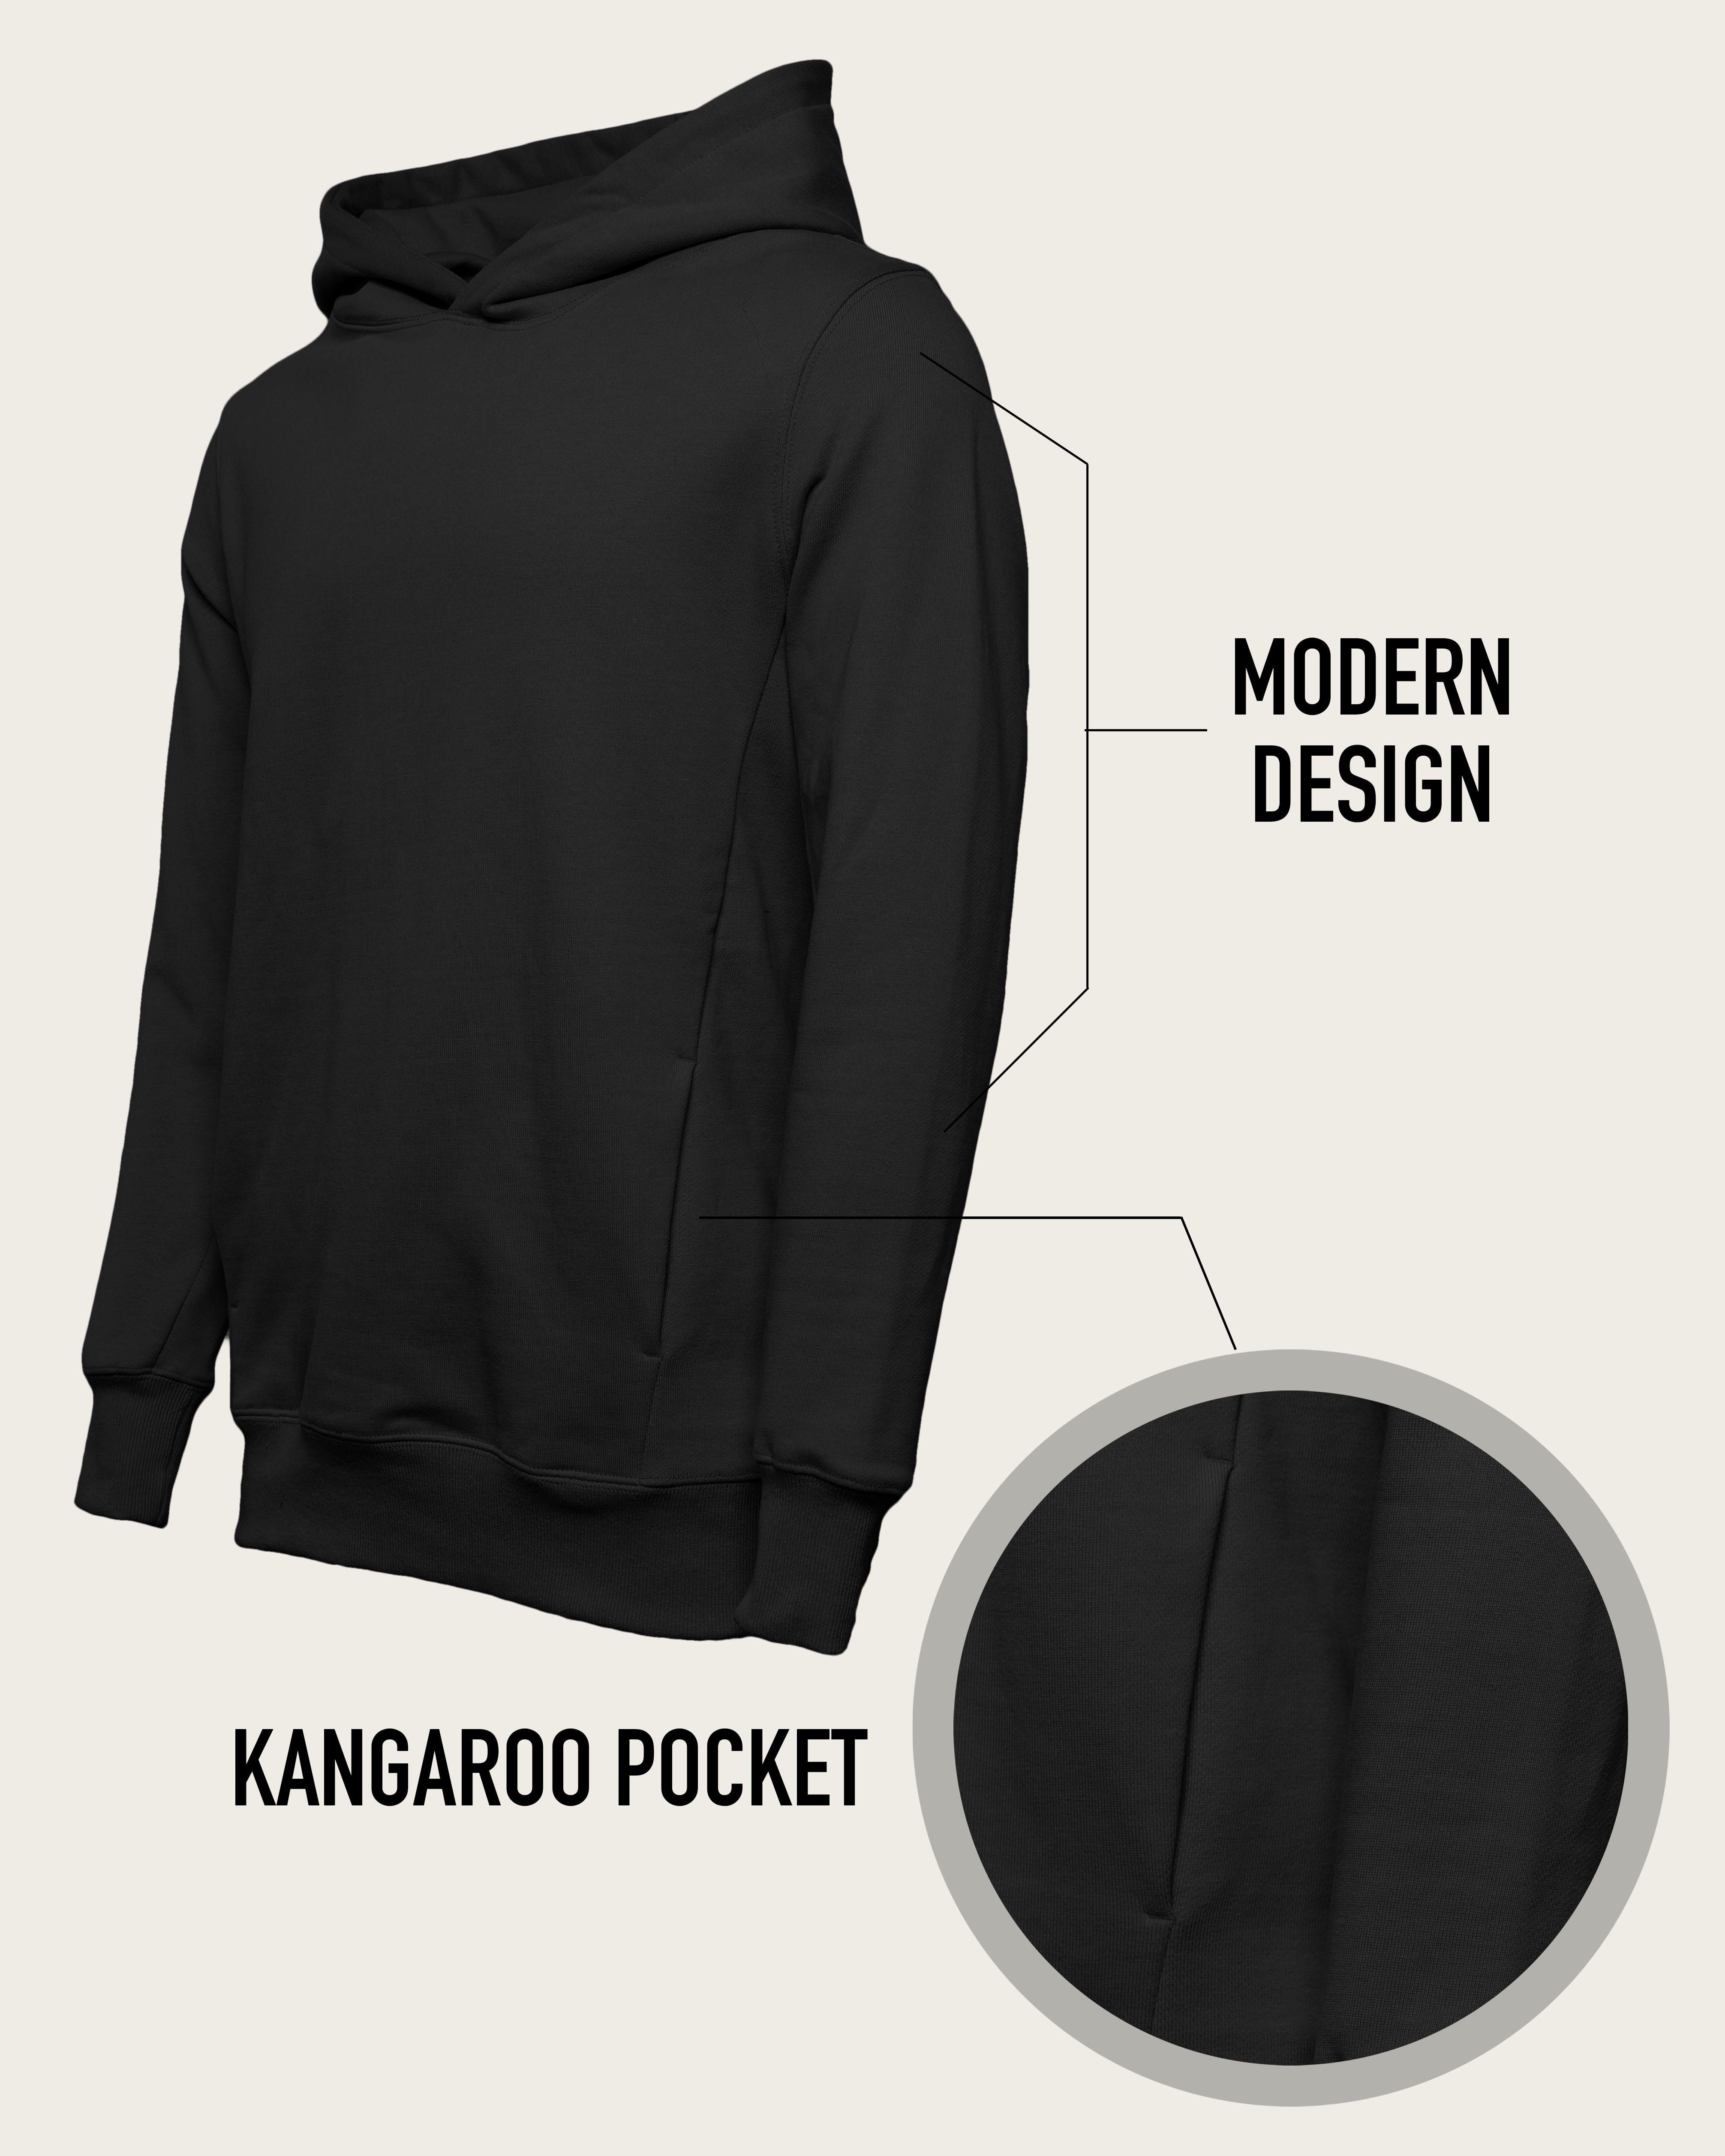 The Esntls Black Hoodie Mens Workout Clothes Mens Casual Outfits Hoodies Men [ 5030 x 4024 Pixel ]